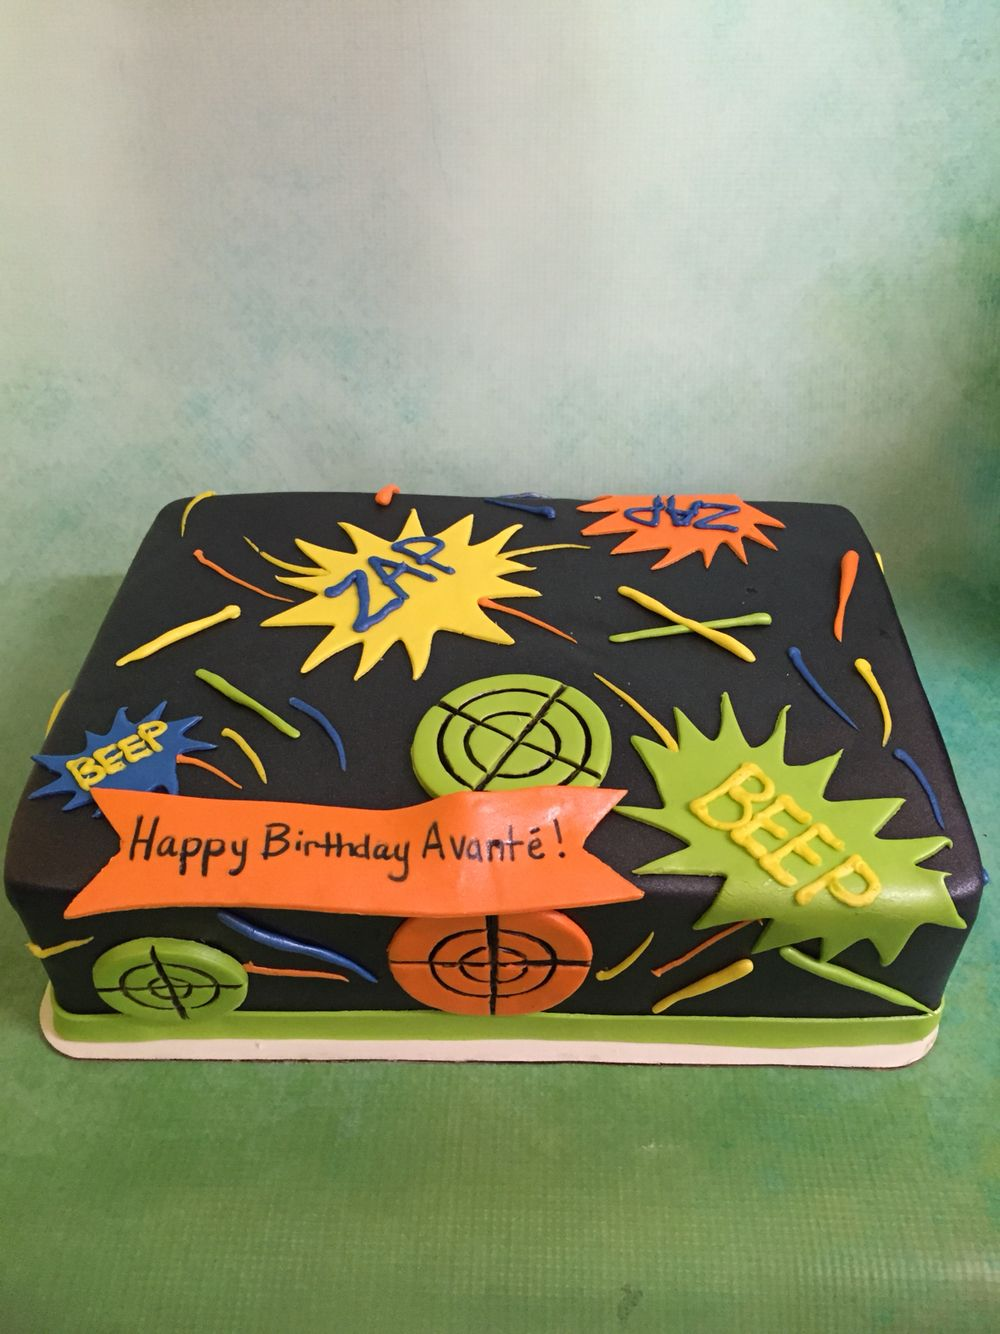 Laser tag cake Midtown Cakes Pinterest Cake Laser tag party